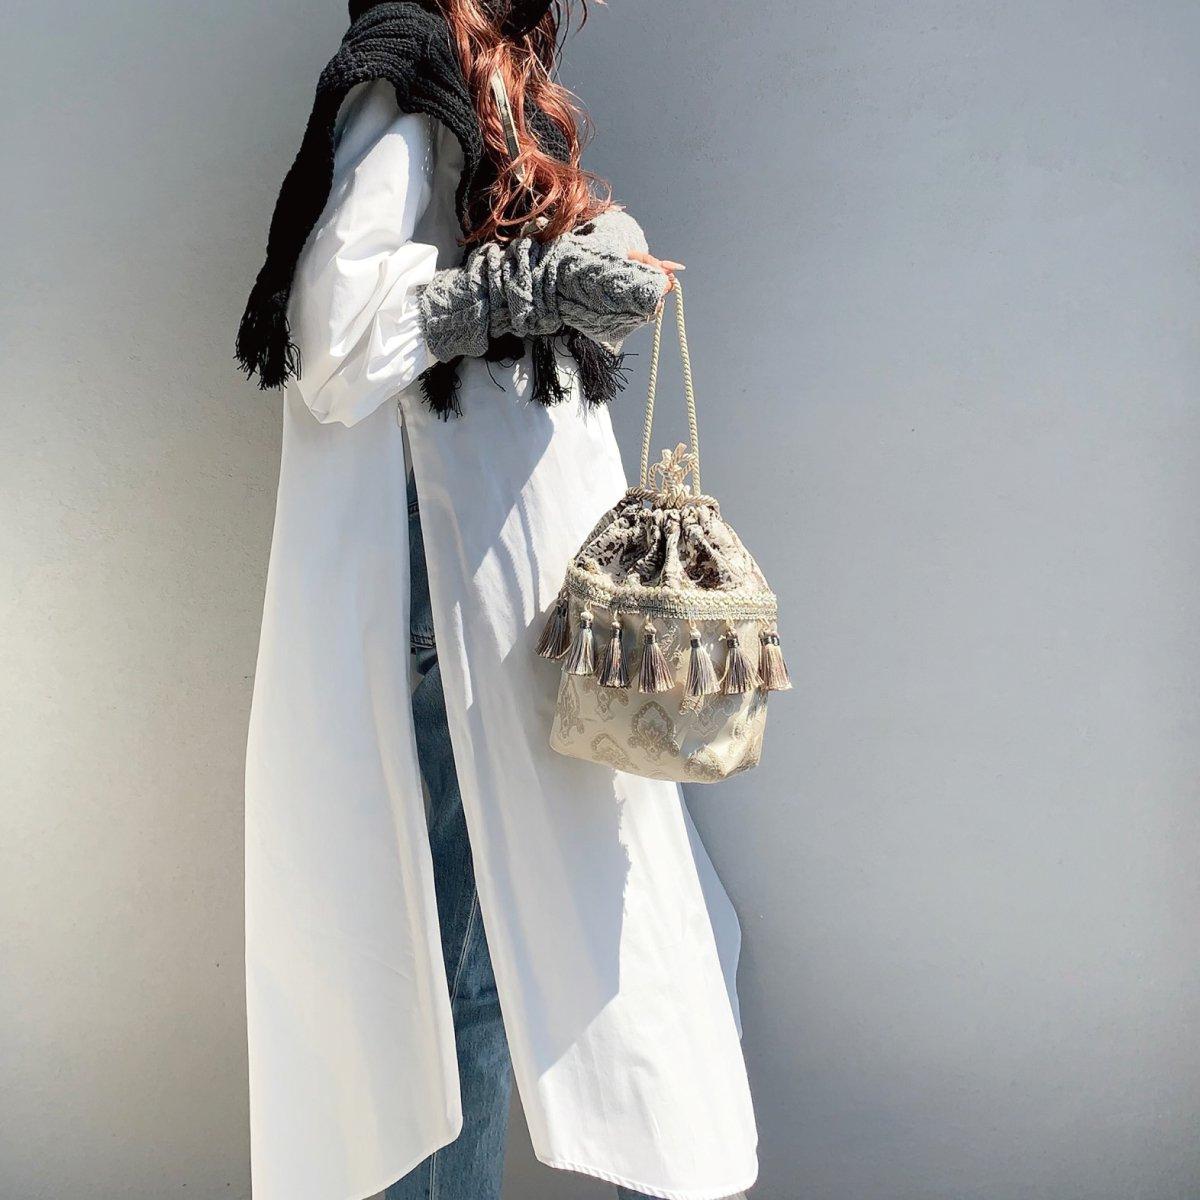 Marrakech Bag 詳細画像14